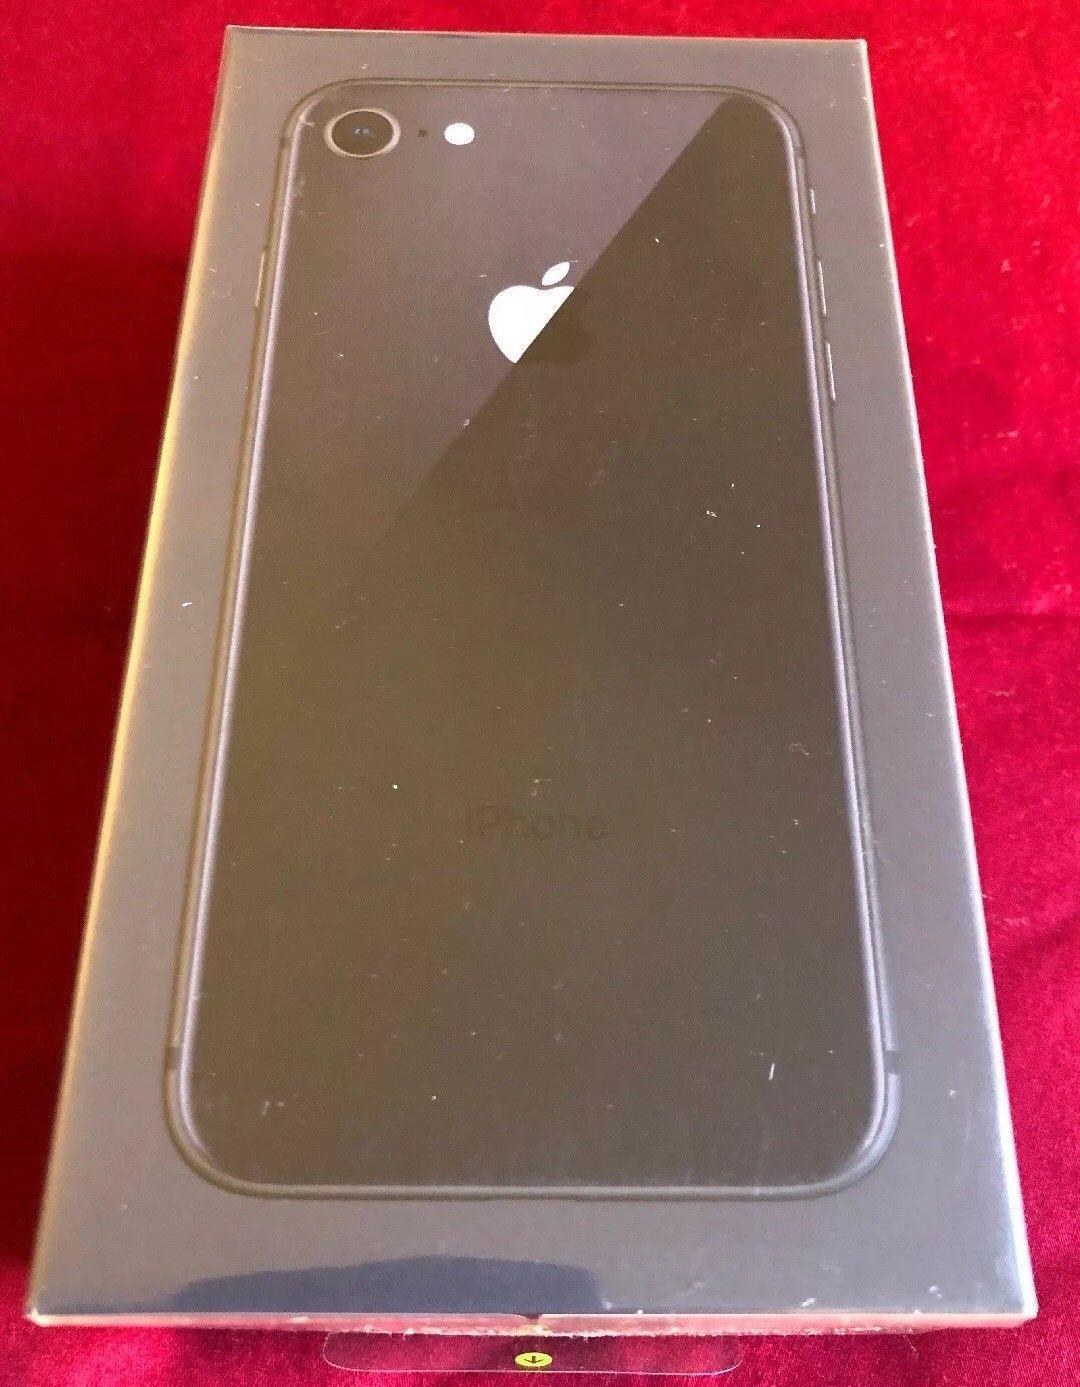 574 99 Iphone 8 Space Gray 64gb Verizon A1863 Cdma Gsm